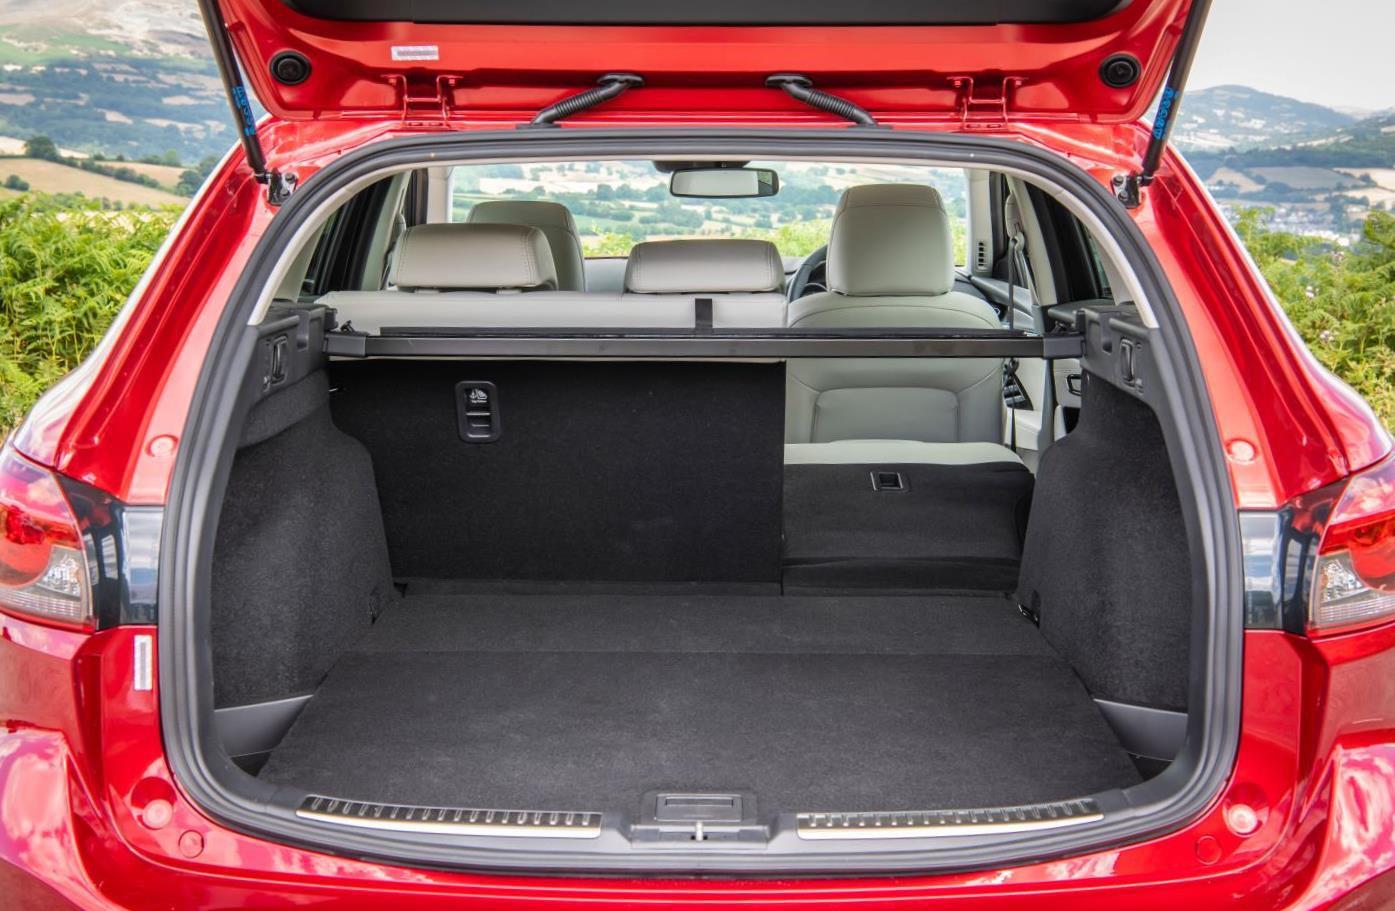 Mazda6 luggage area